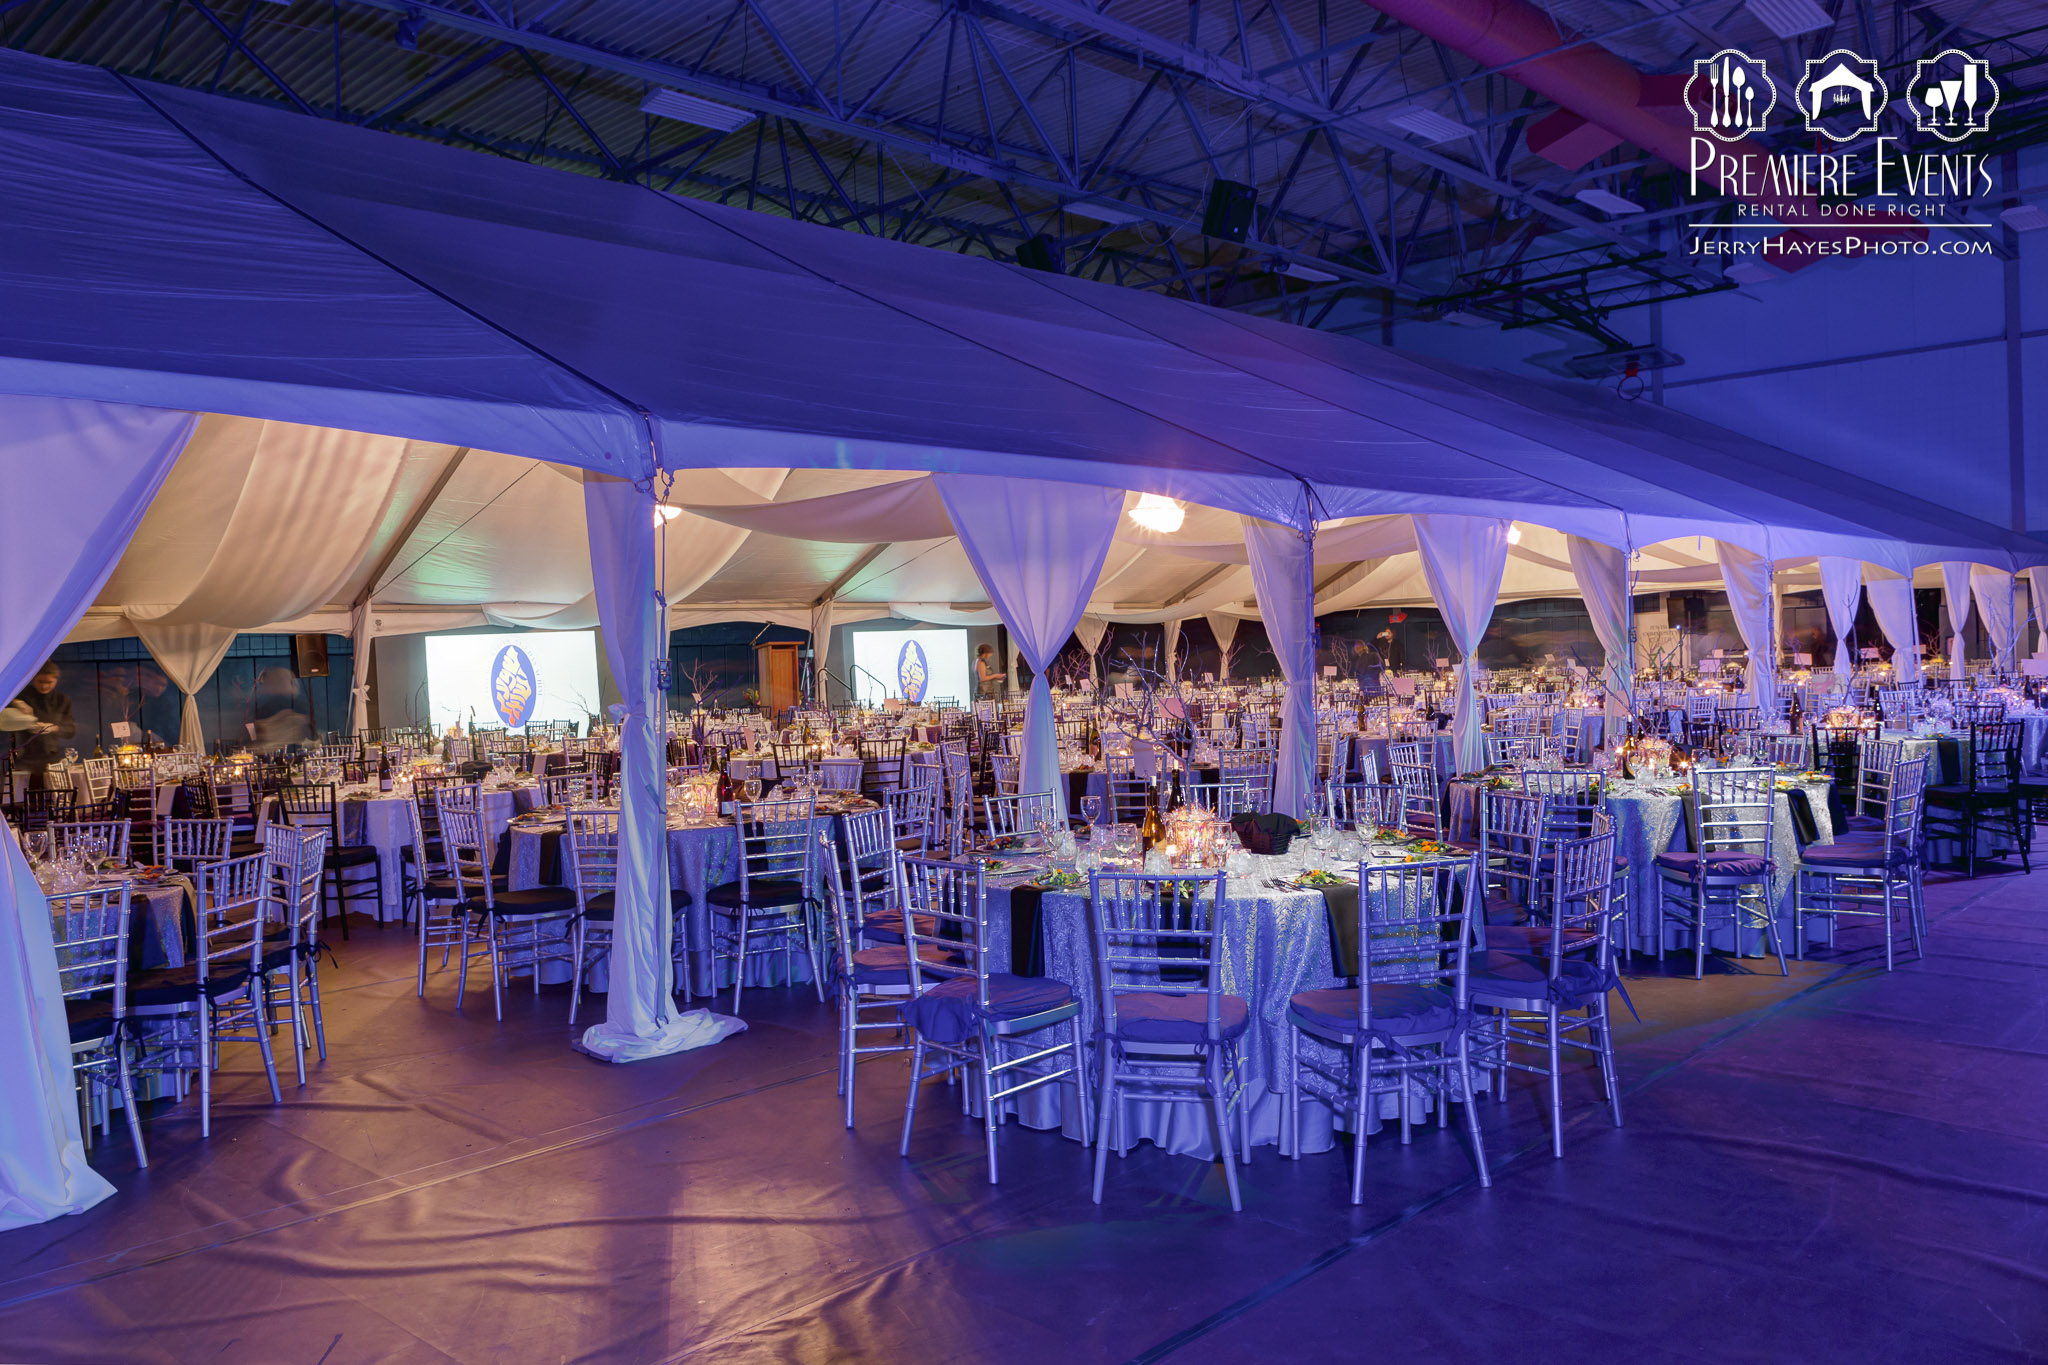 Congregation Agudas Achim Centennial Gala Premiere Events